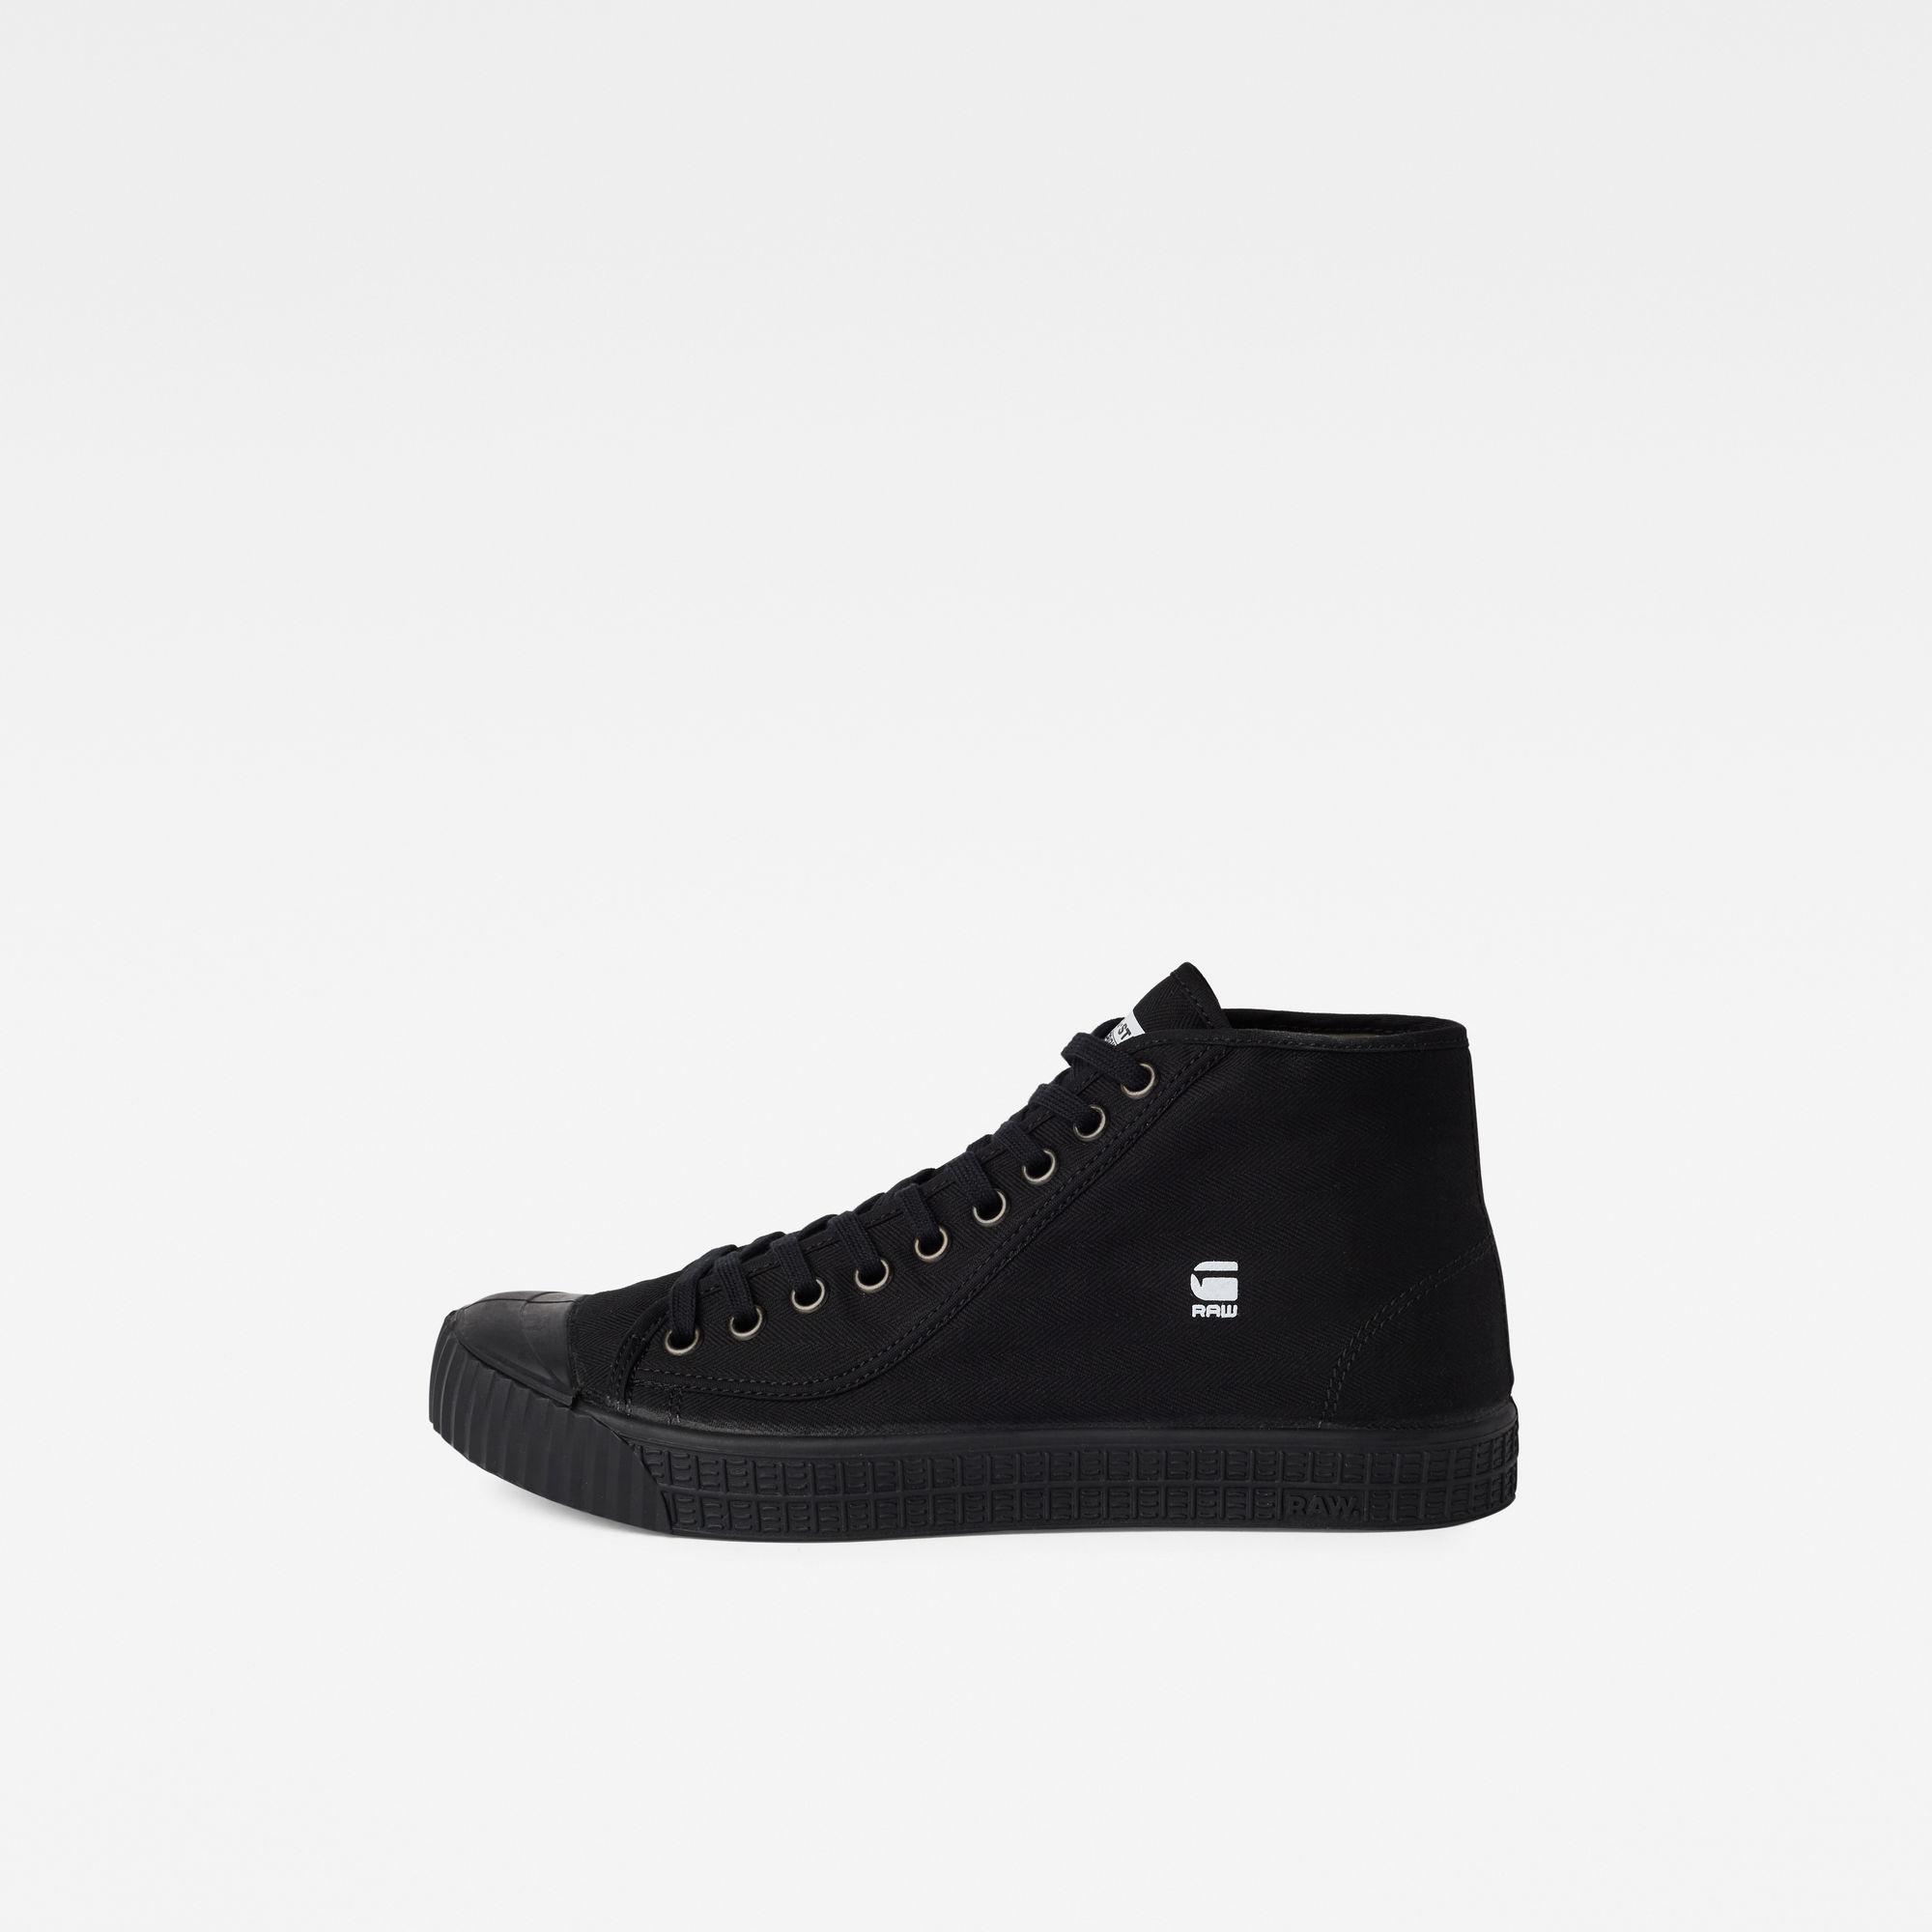 G-Star RAW Rovulc HB Mid Sneakers Black Men